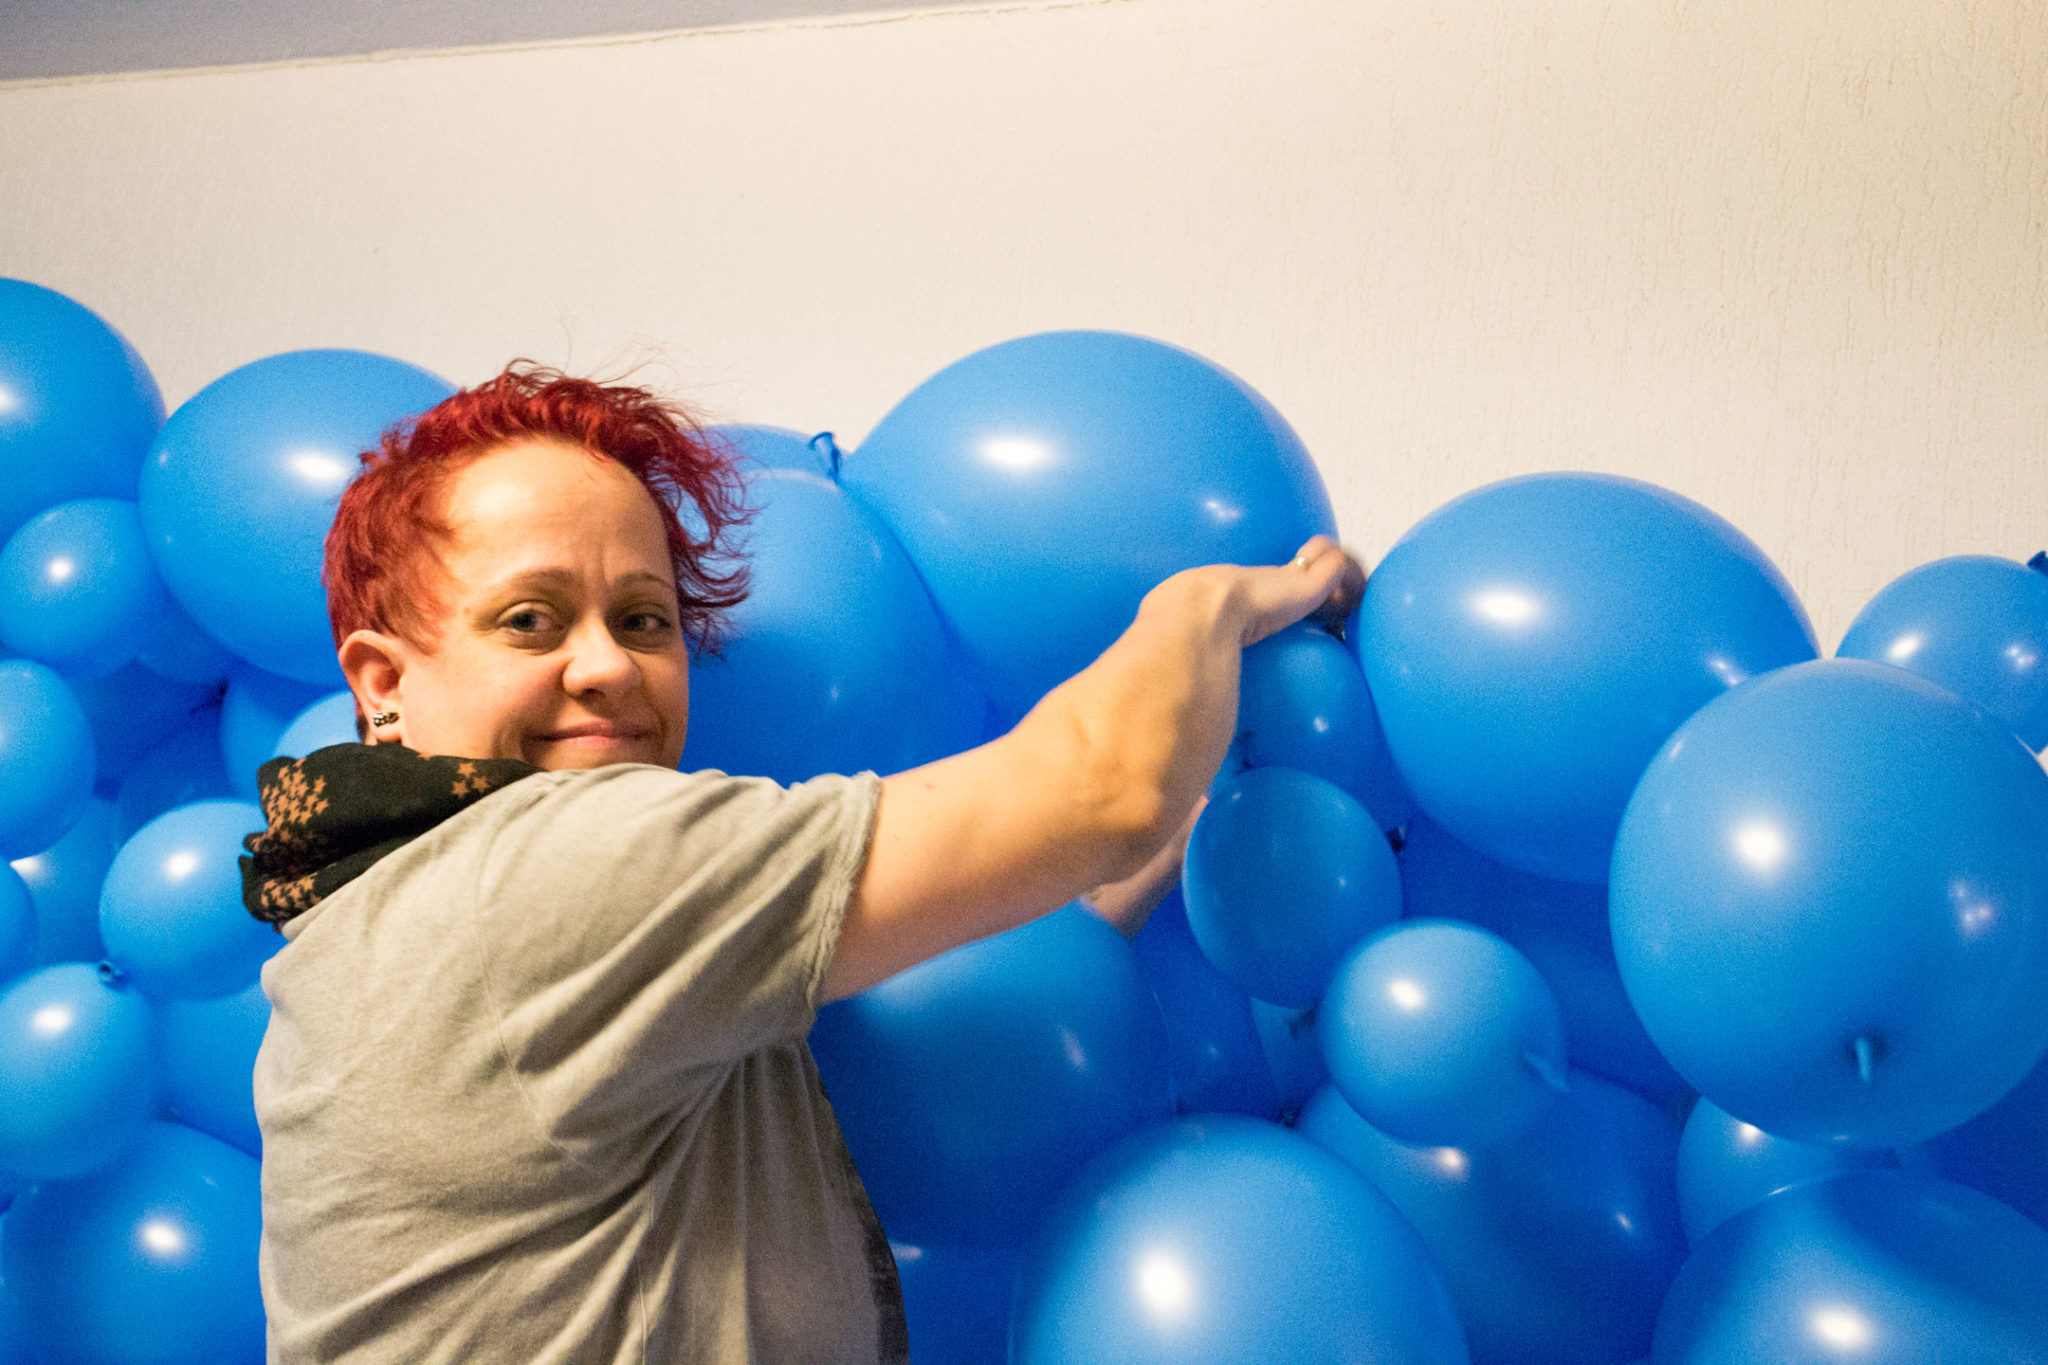 Entstehung Luftballon Fotostudio Kinderfotograf Bild 07